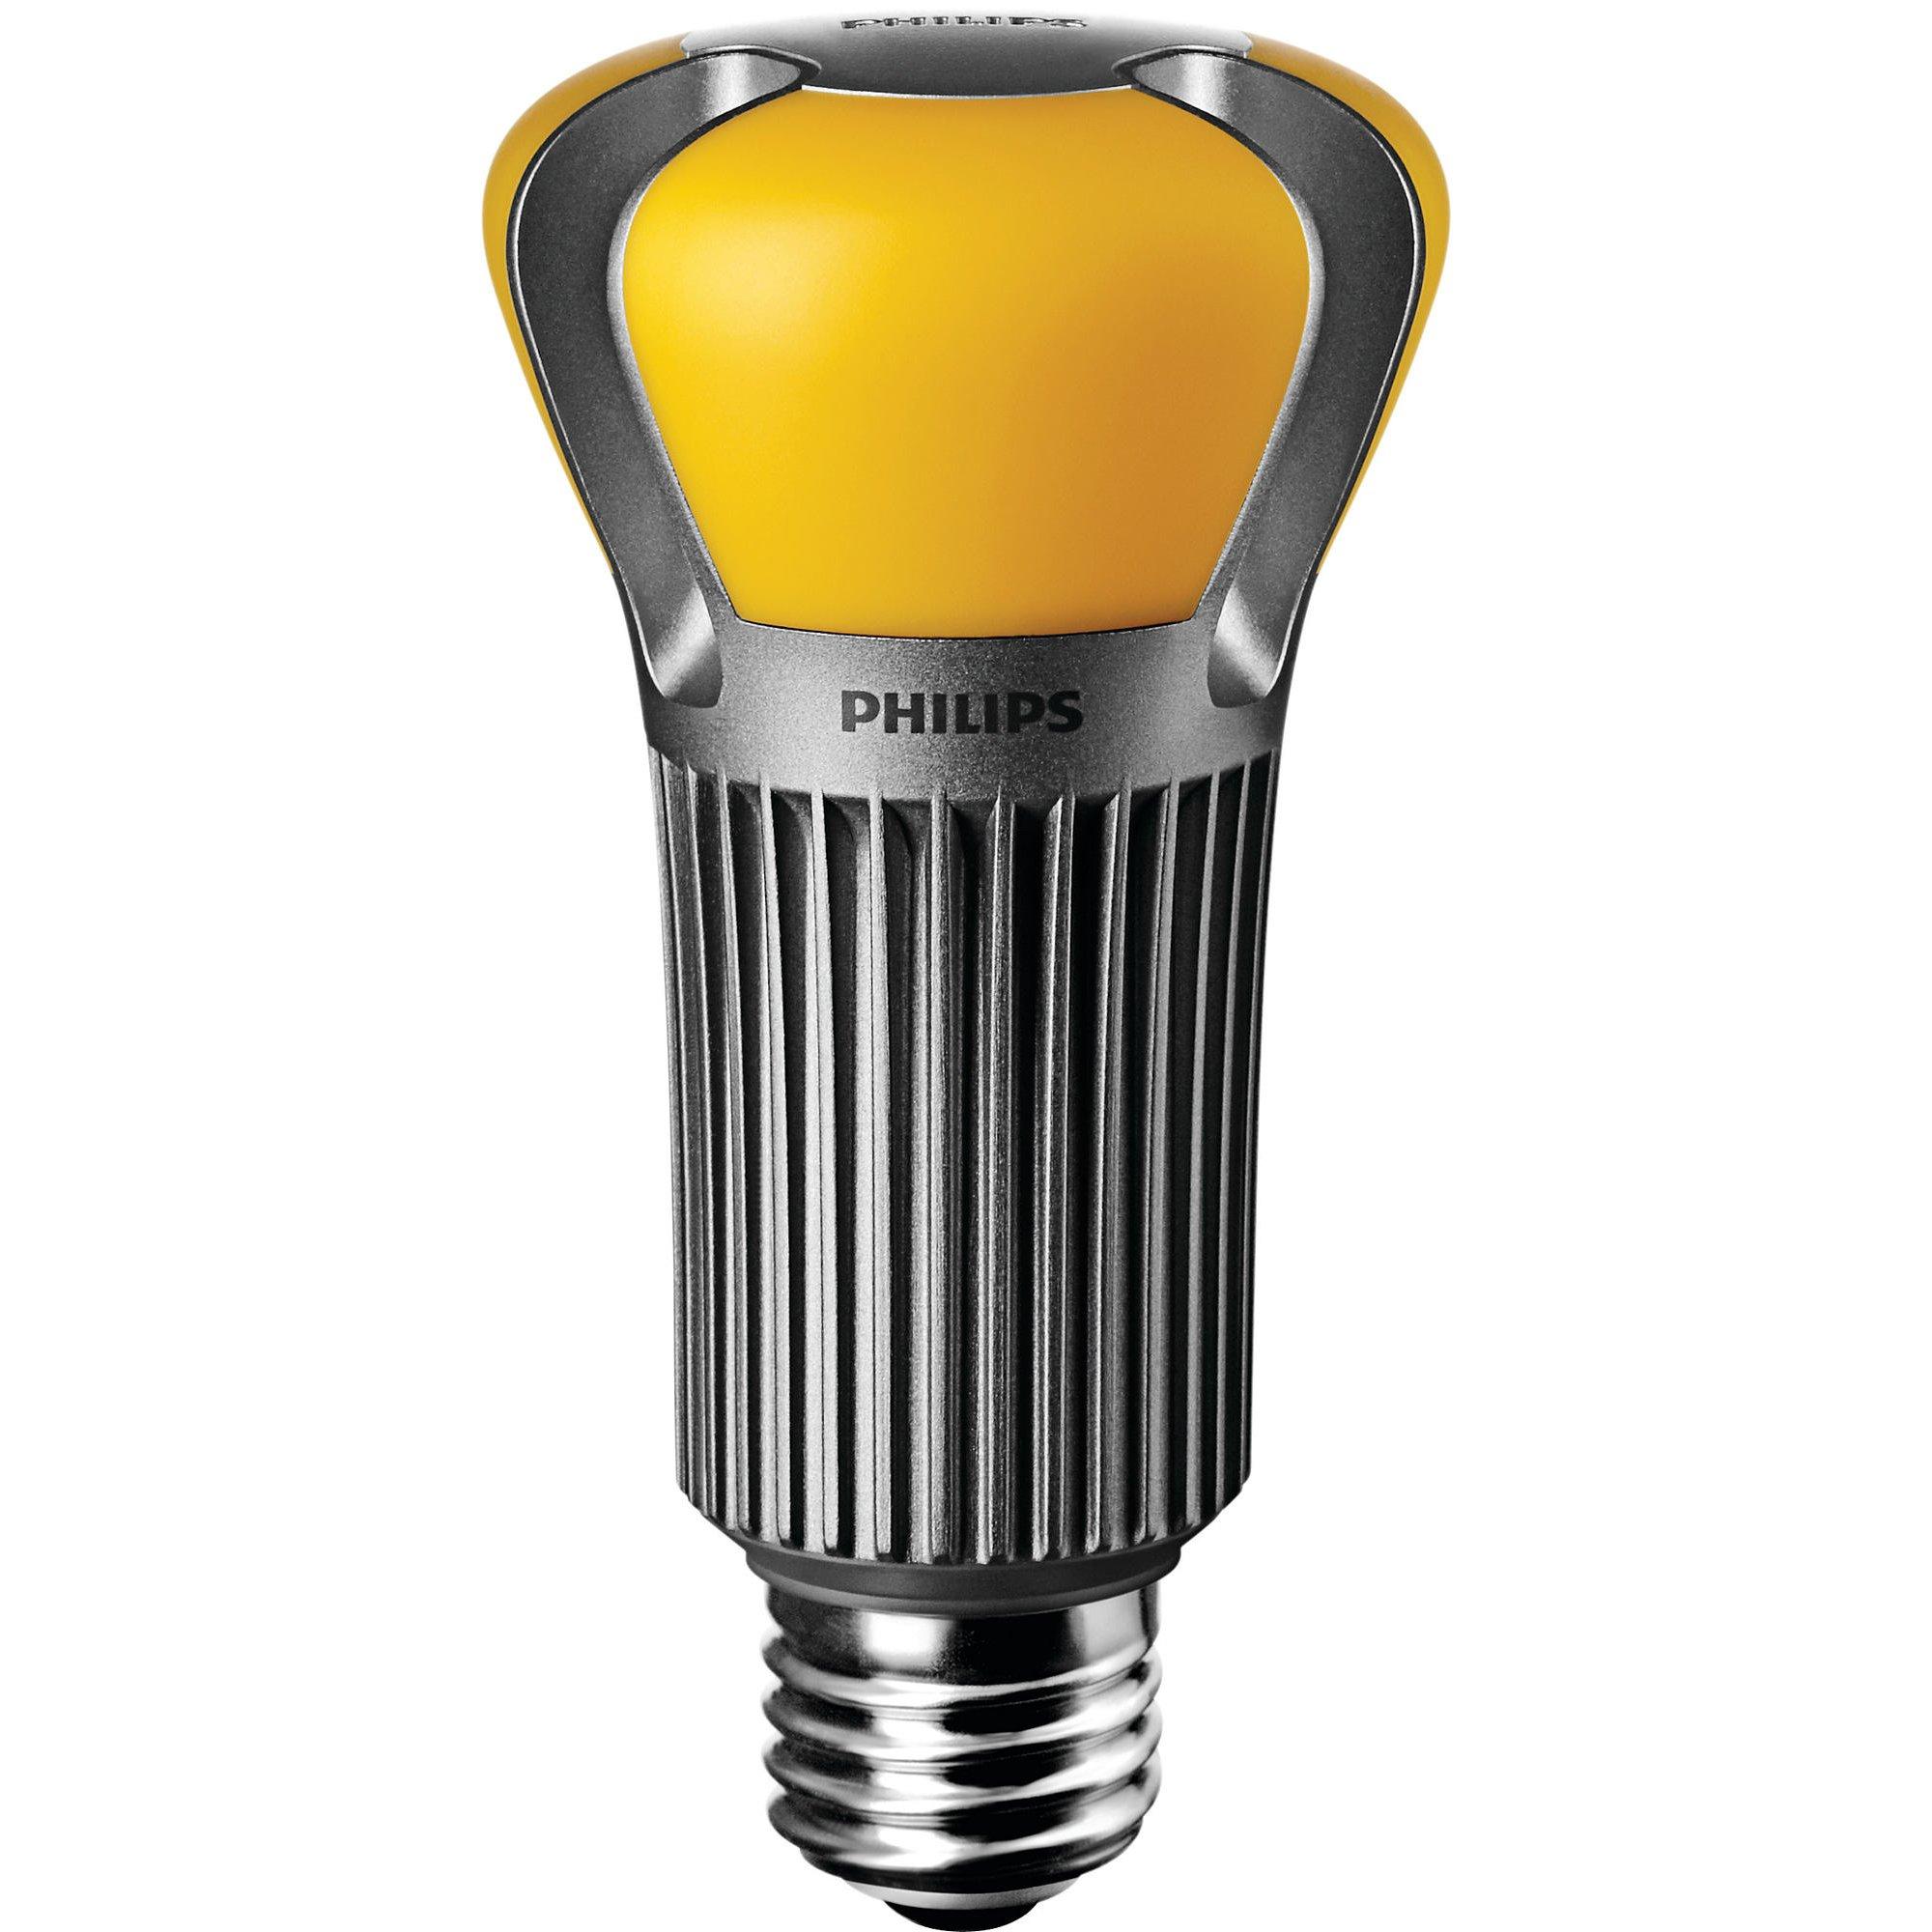 Philips Master LEDbulb - 20W E27